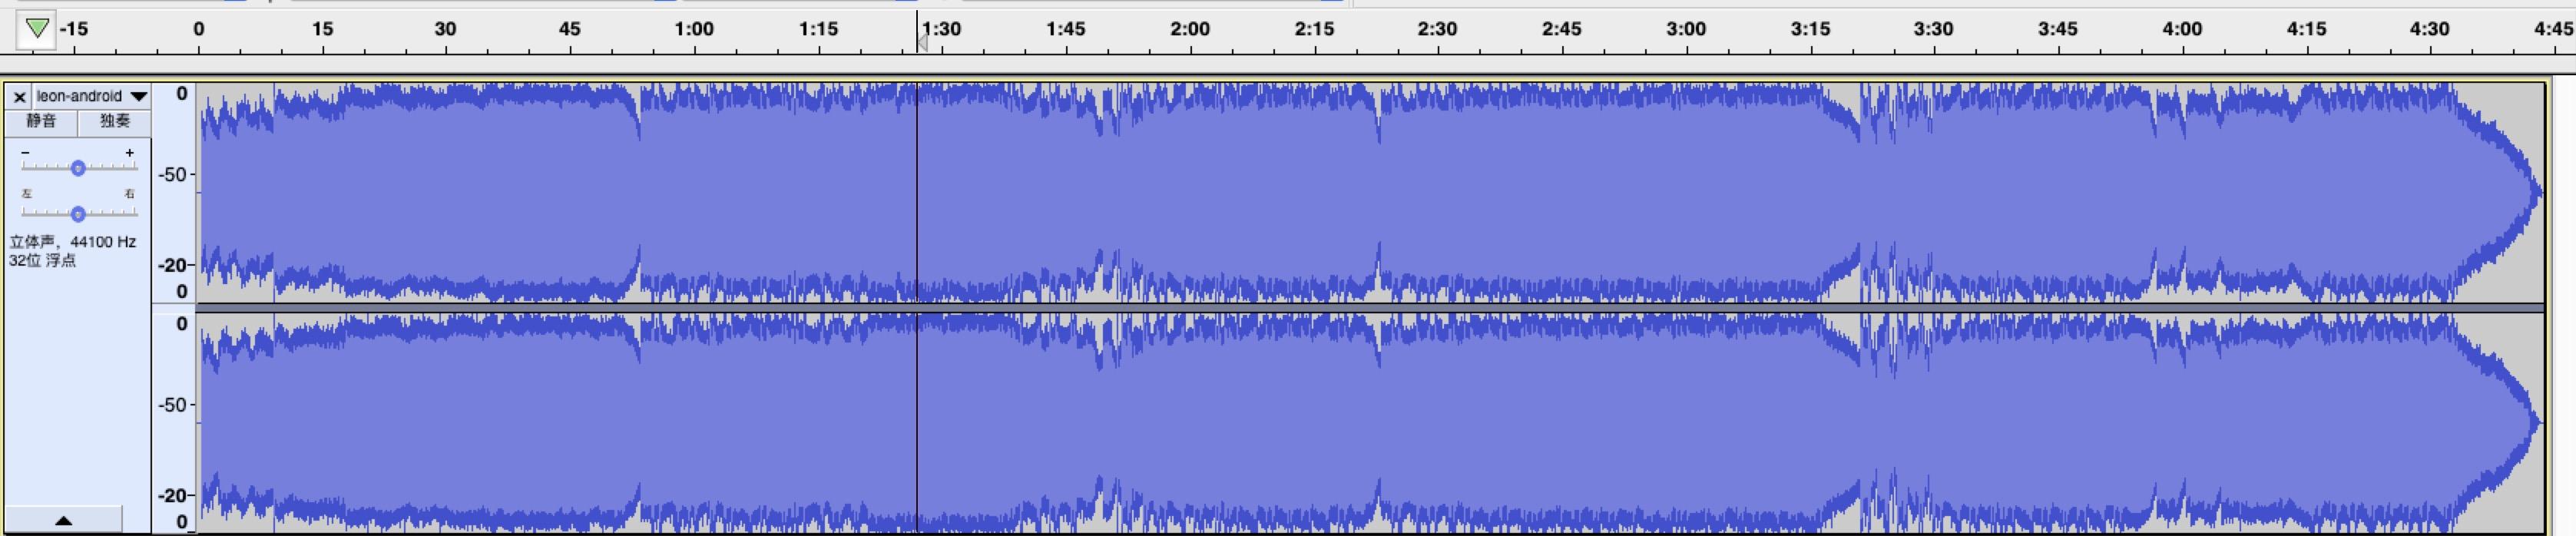 PCM-响度